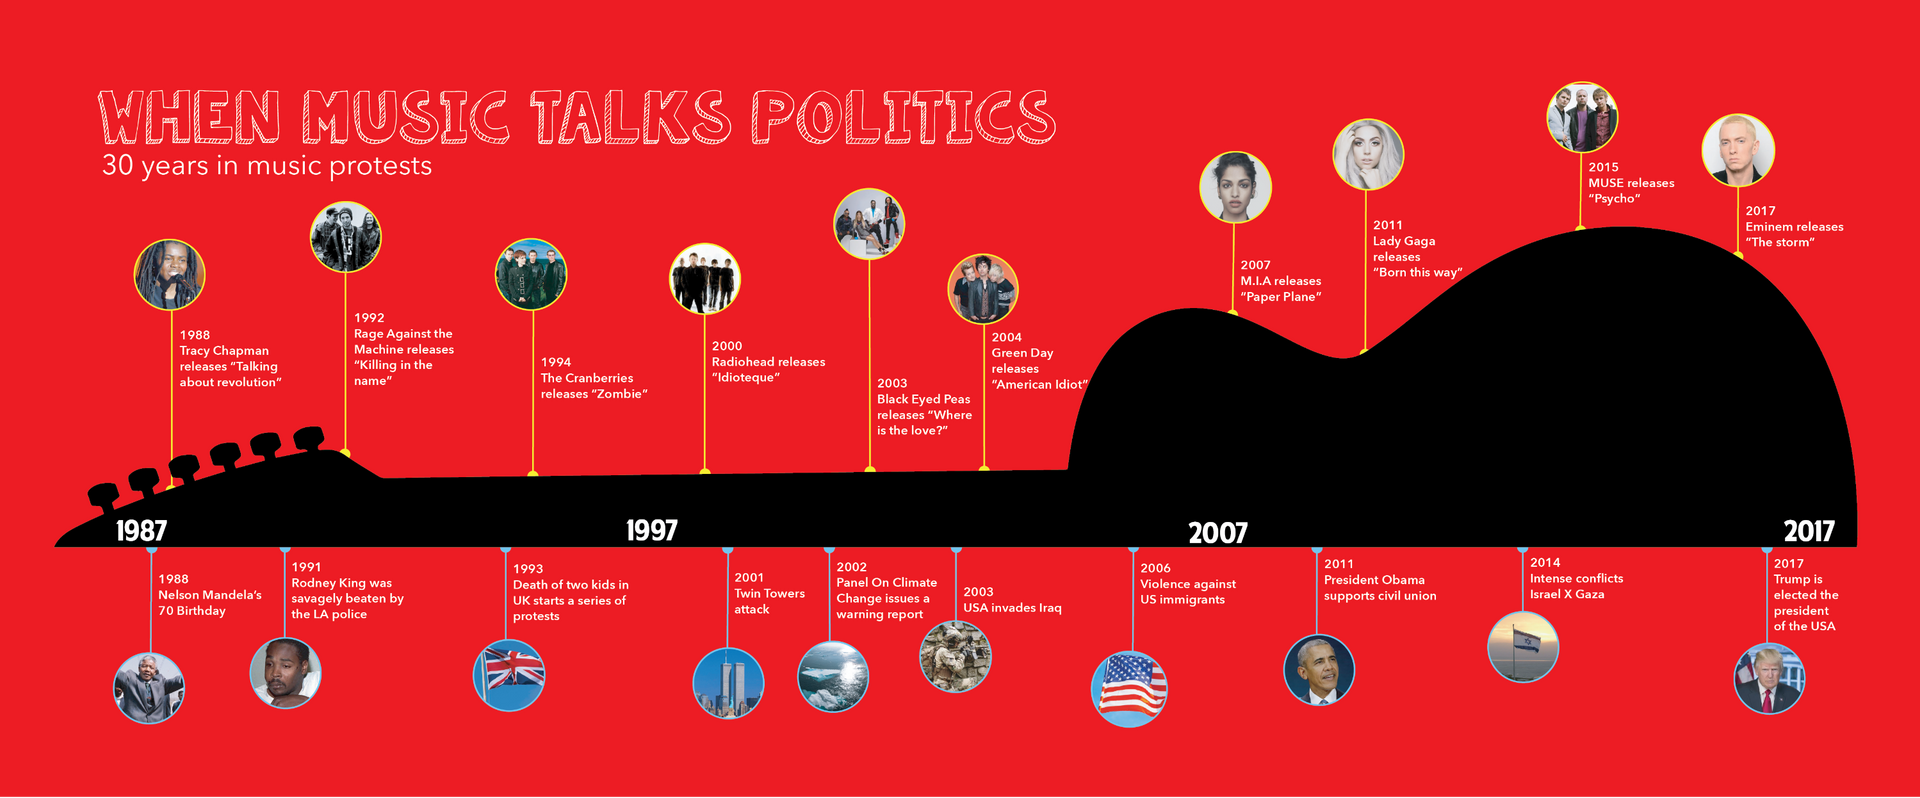 When Music Talks Politics